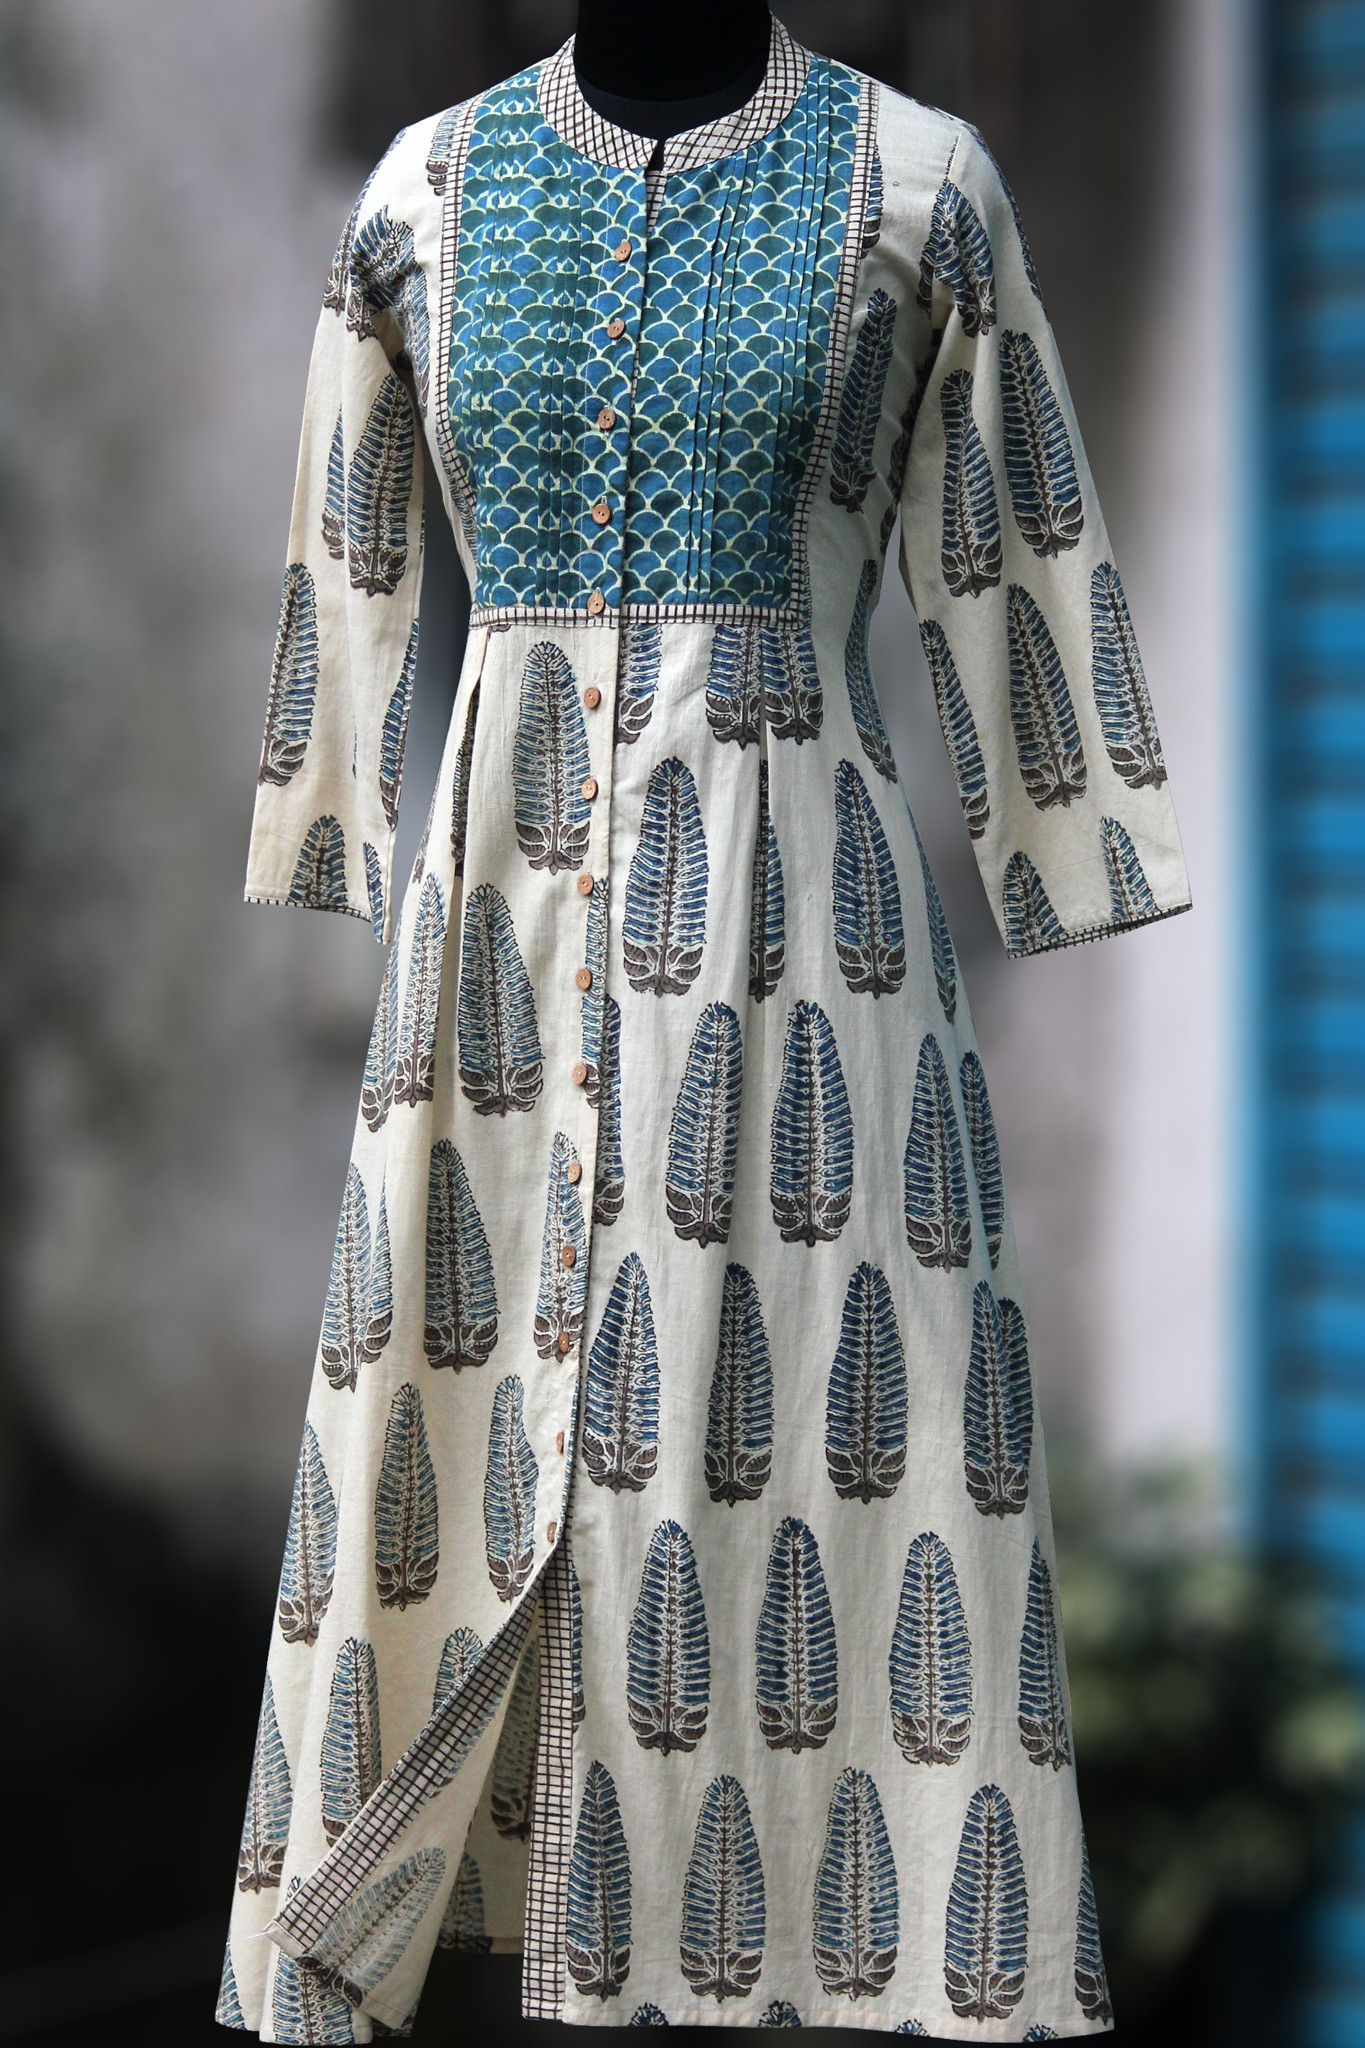 Churidar dress patterns images of nature